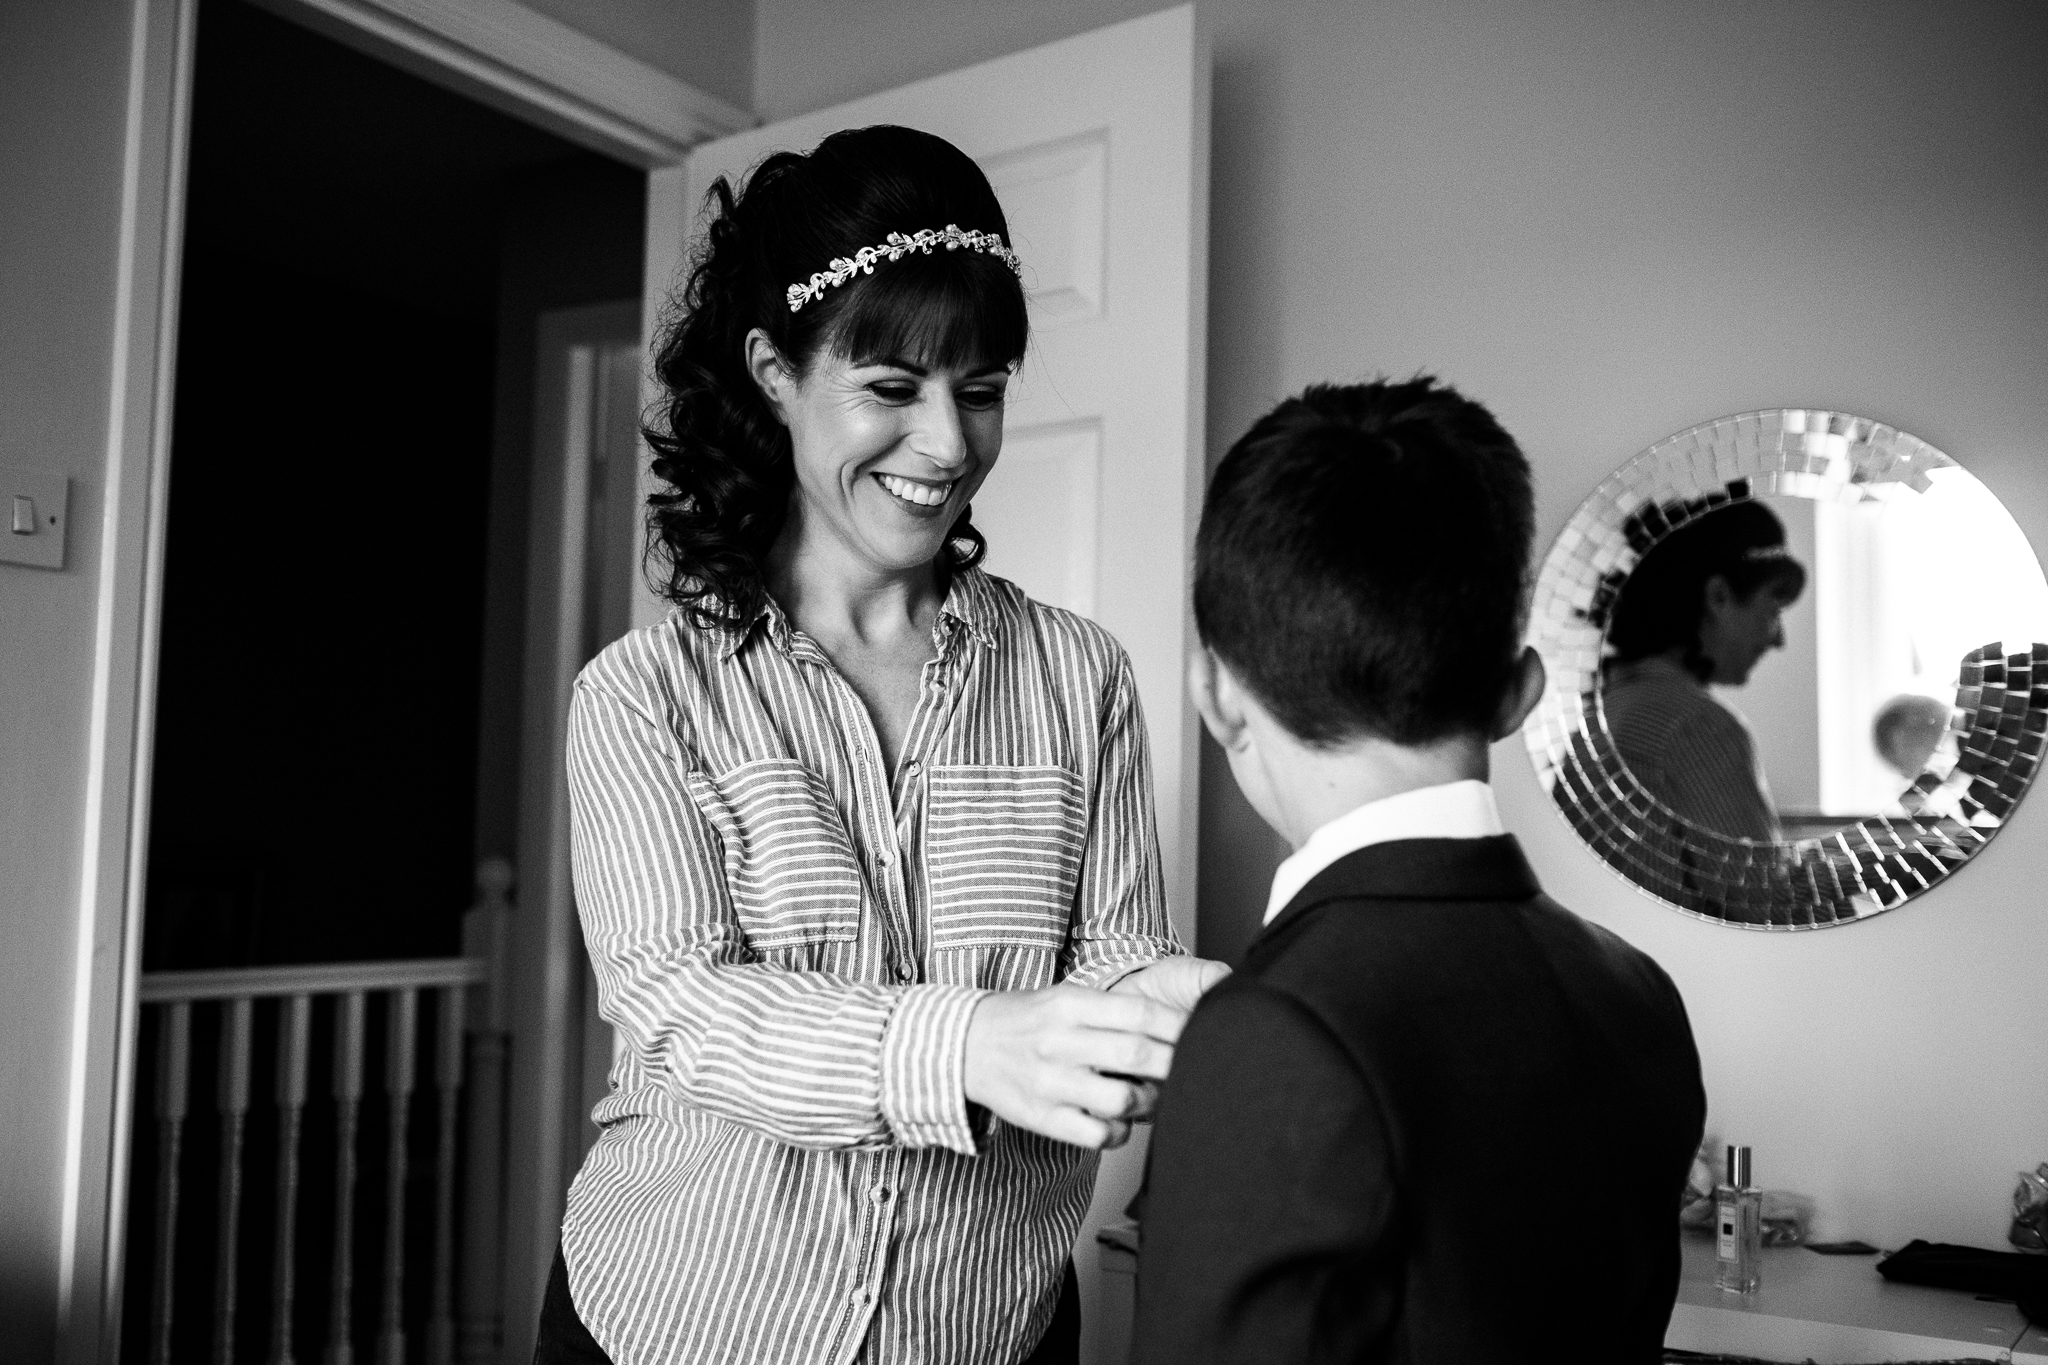 Cheshire Wedding Photography at Crewe Lyceum Theatre Stage Wedding Art Deco 20s - Jenny Harper-5.jpg